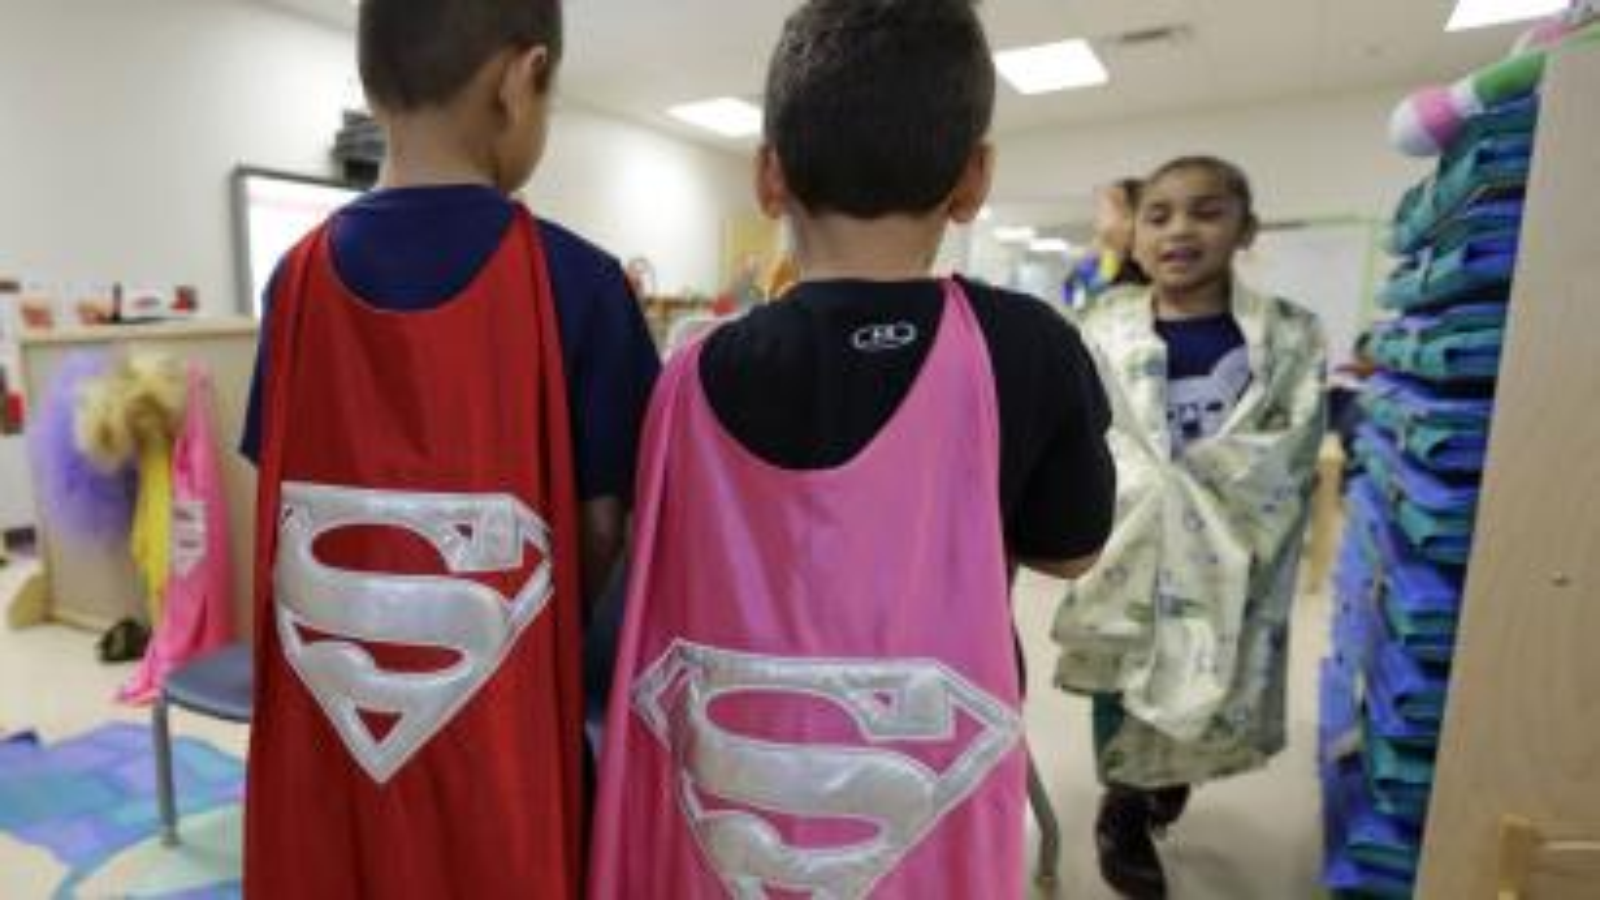 Kids dressed up as Superman